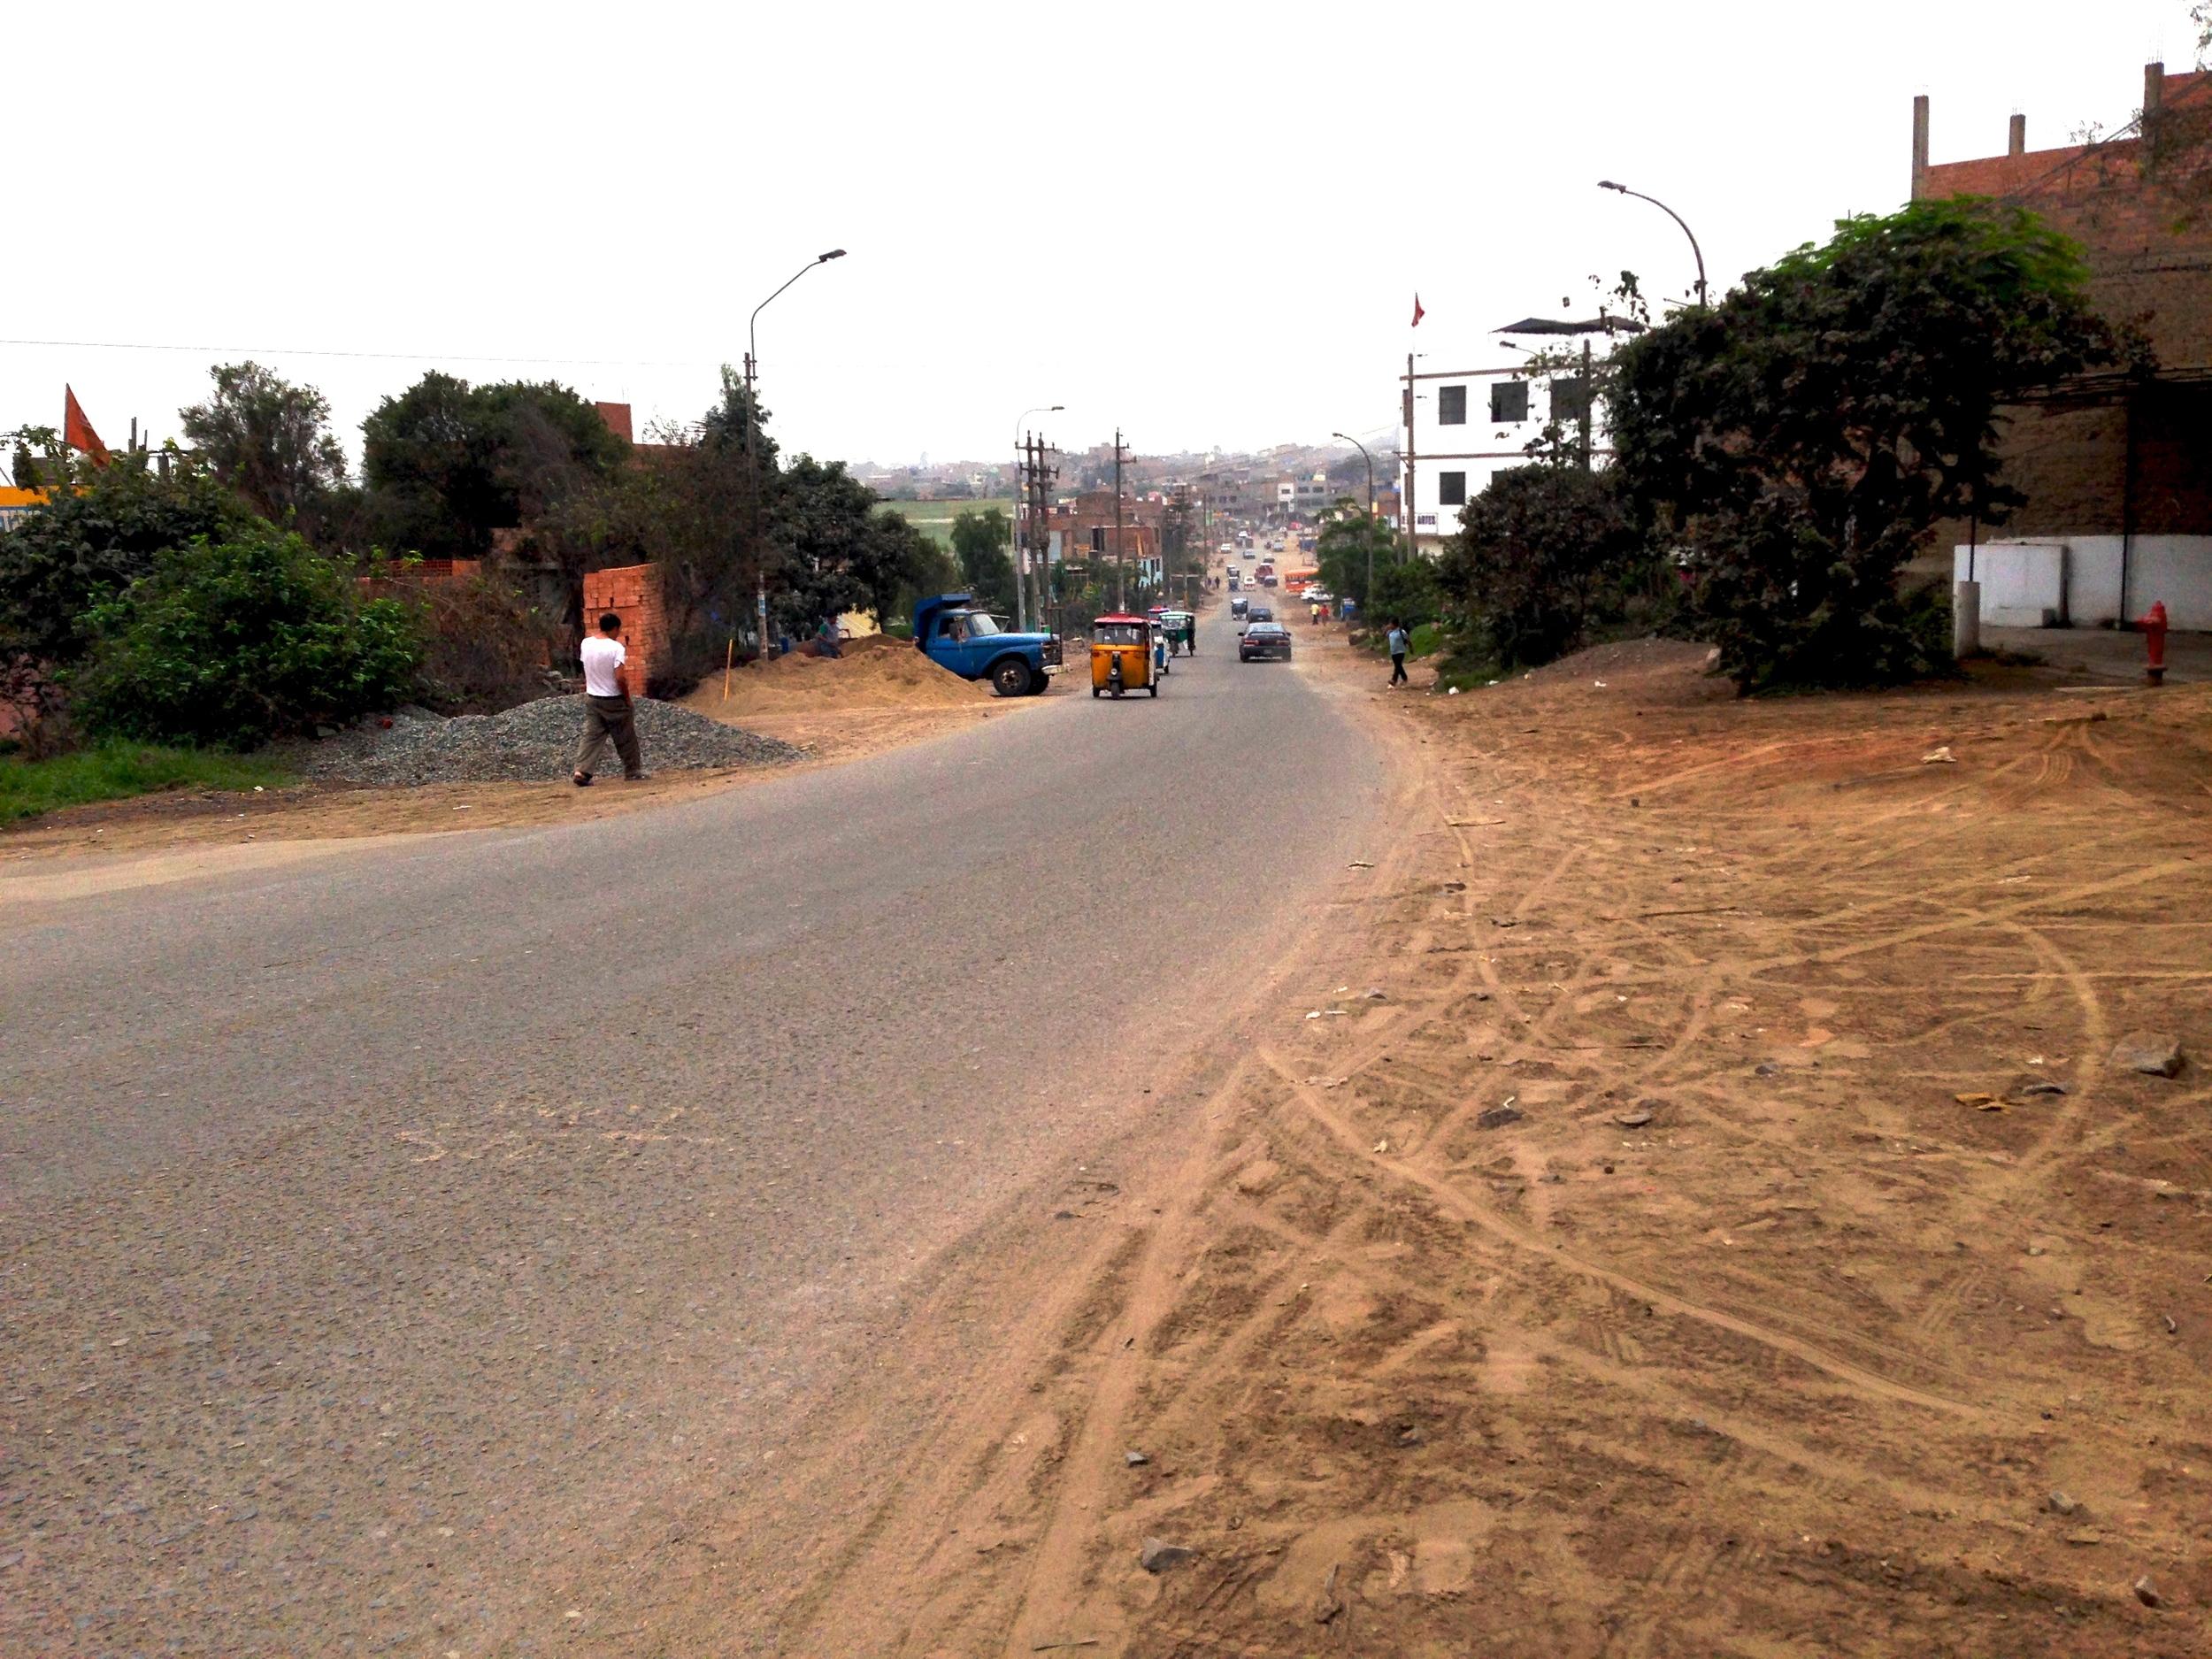 Comas. Banlieue du cône Nord de Lima